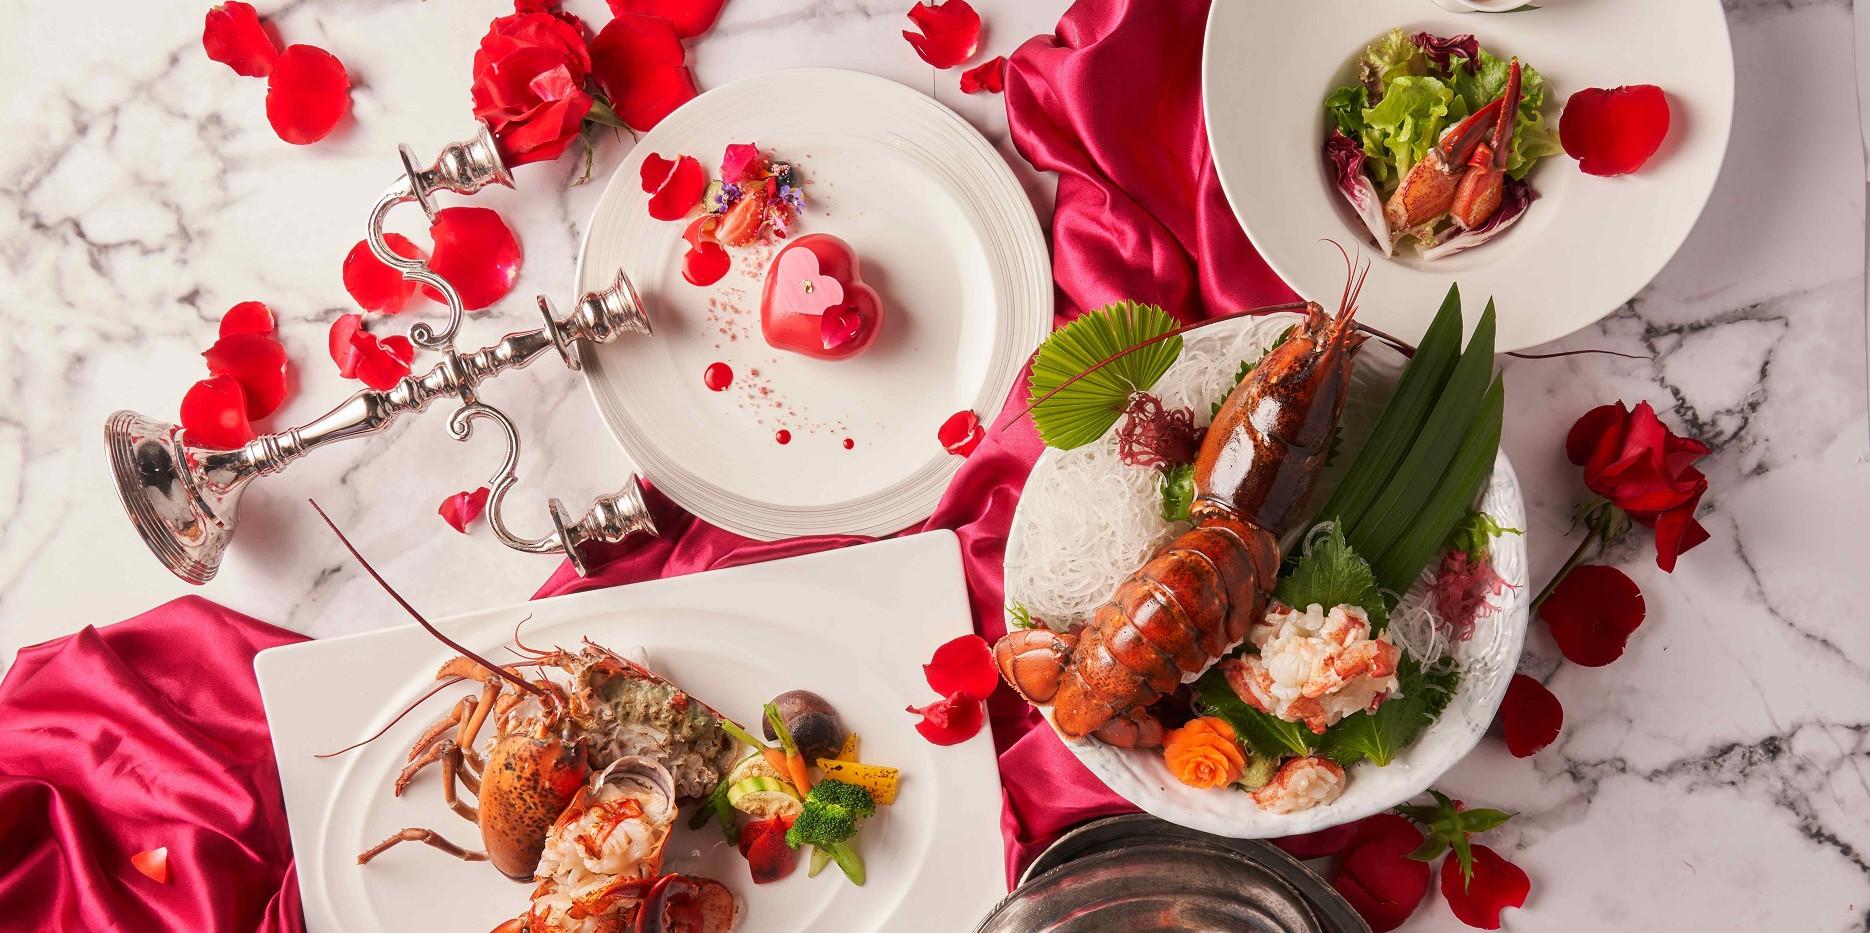 KiSara-Valentines-Day (1).jpeg